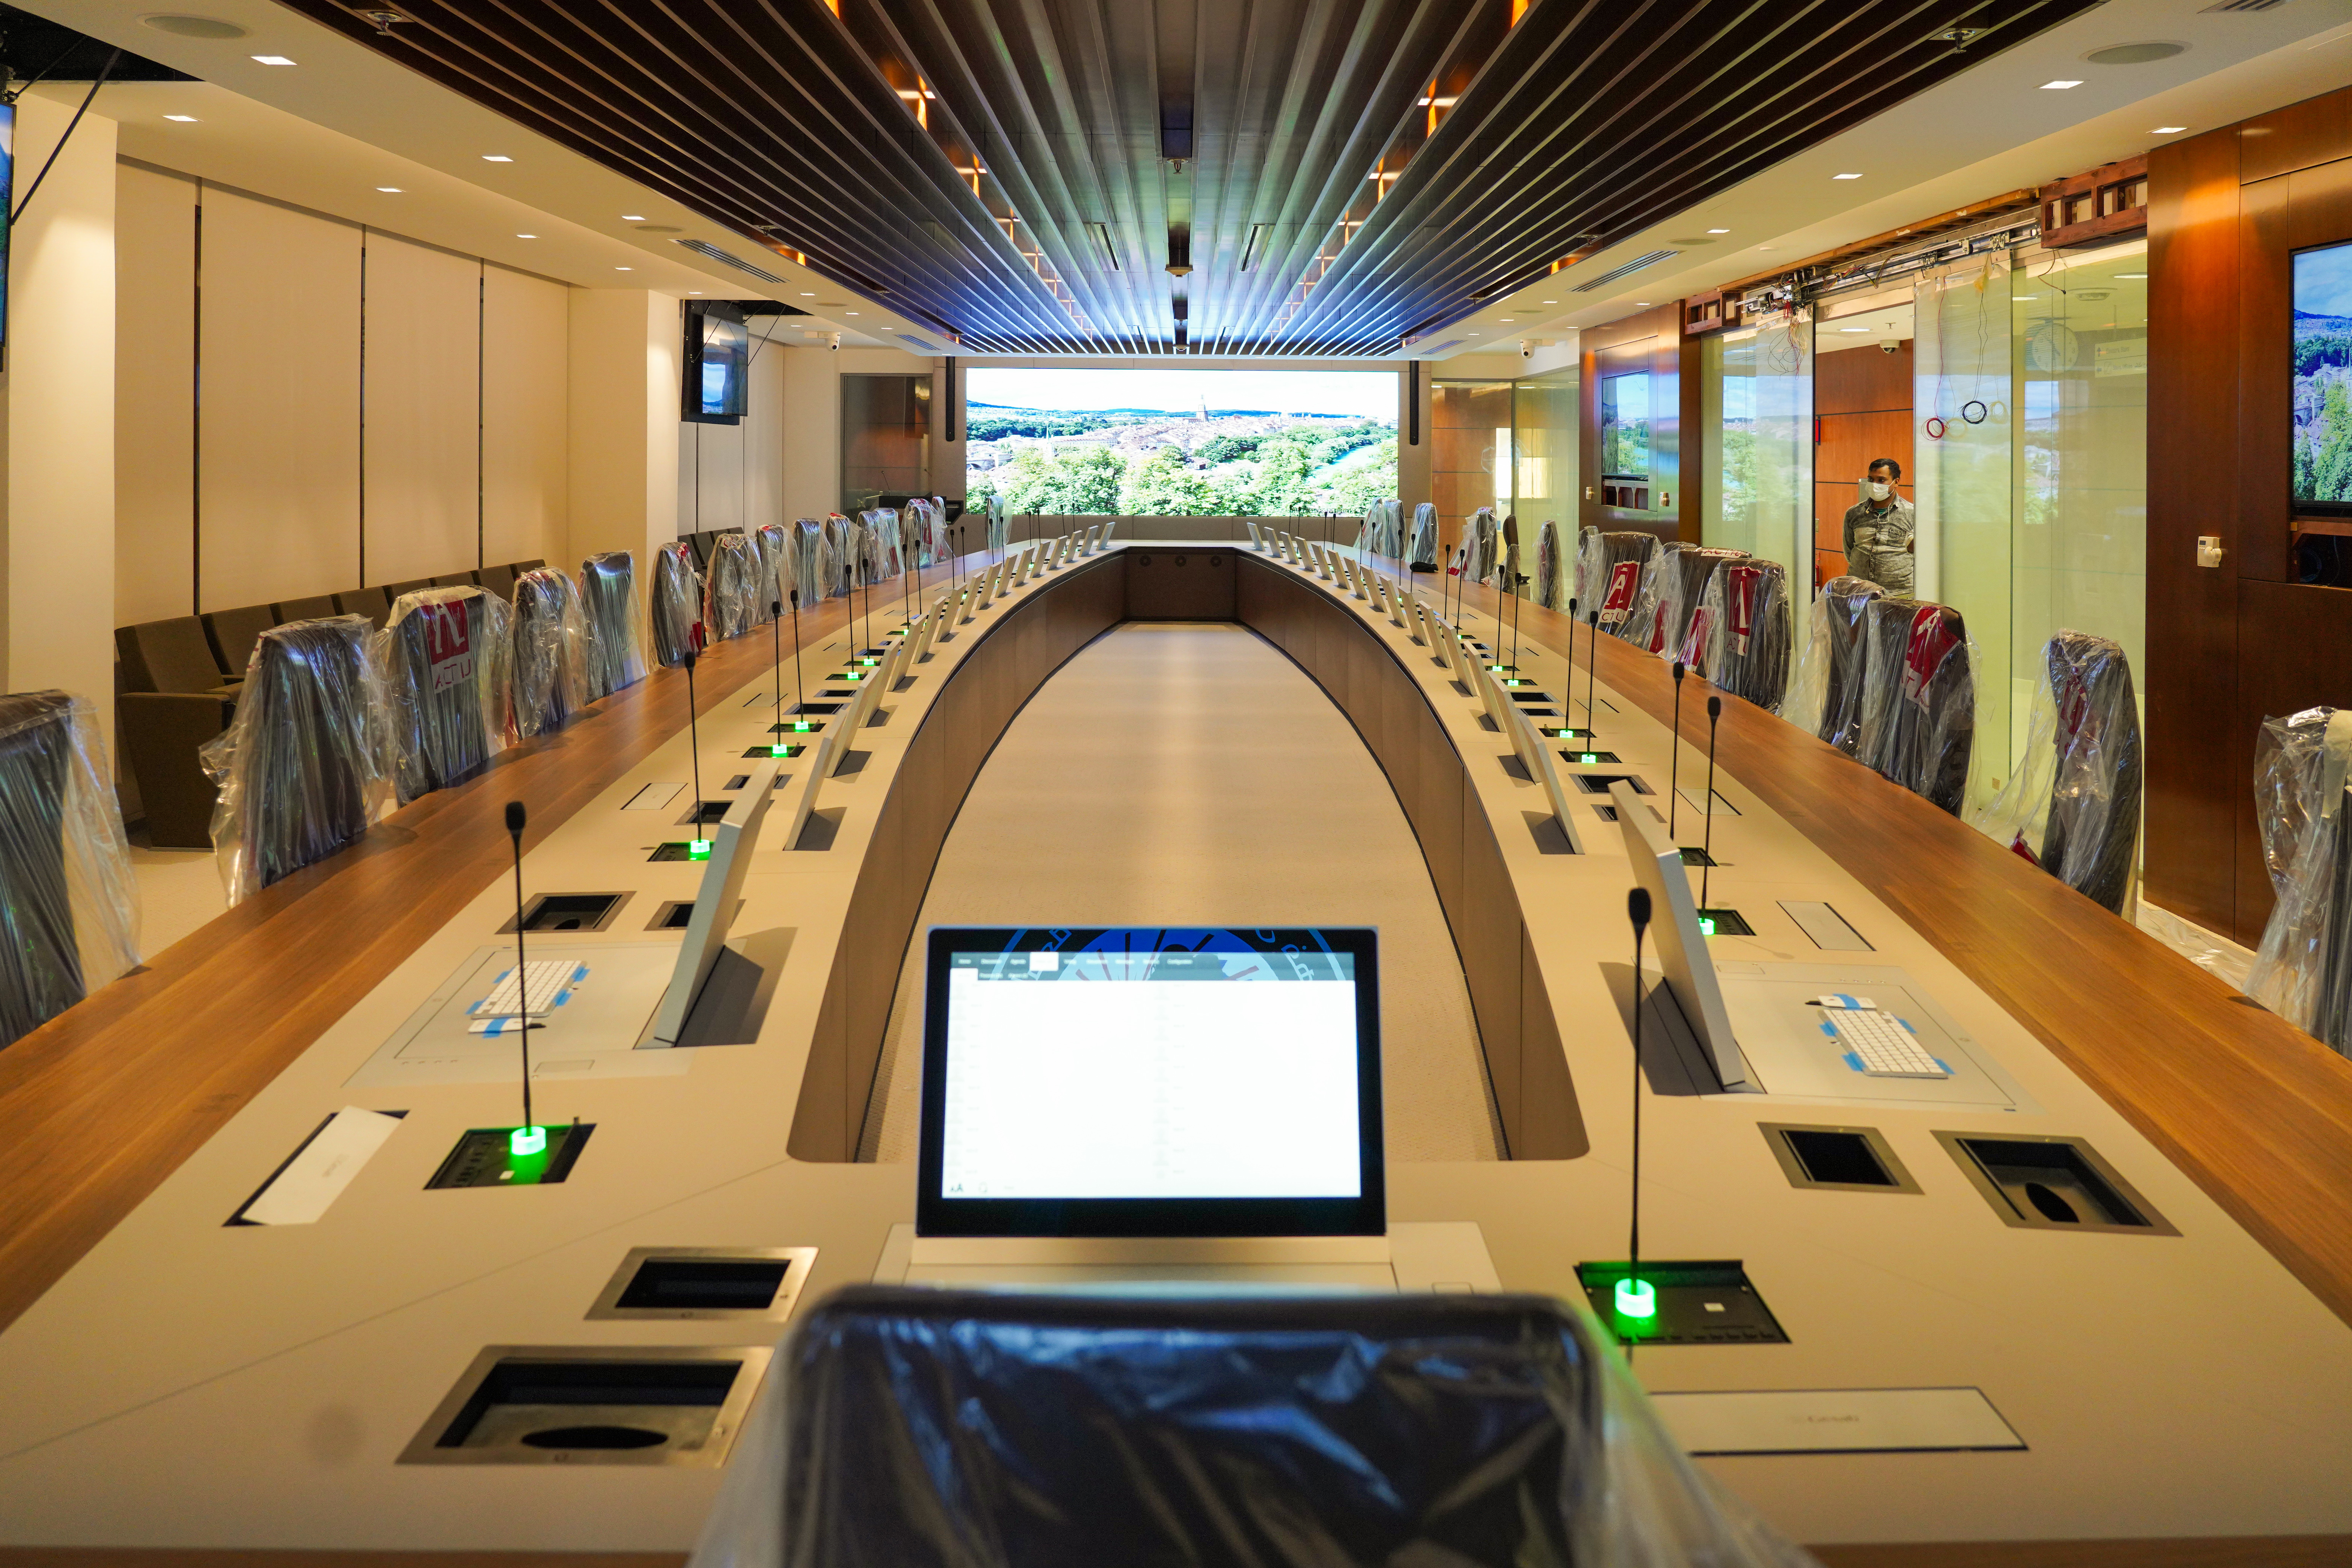 Der Konferenzraum der Prince Mohammad Bin Fahd University in Al Khobar